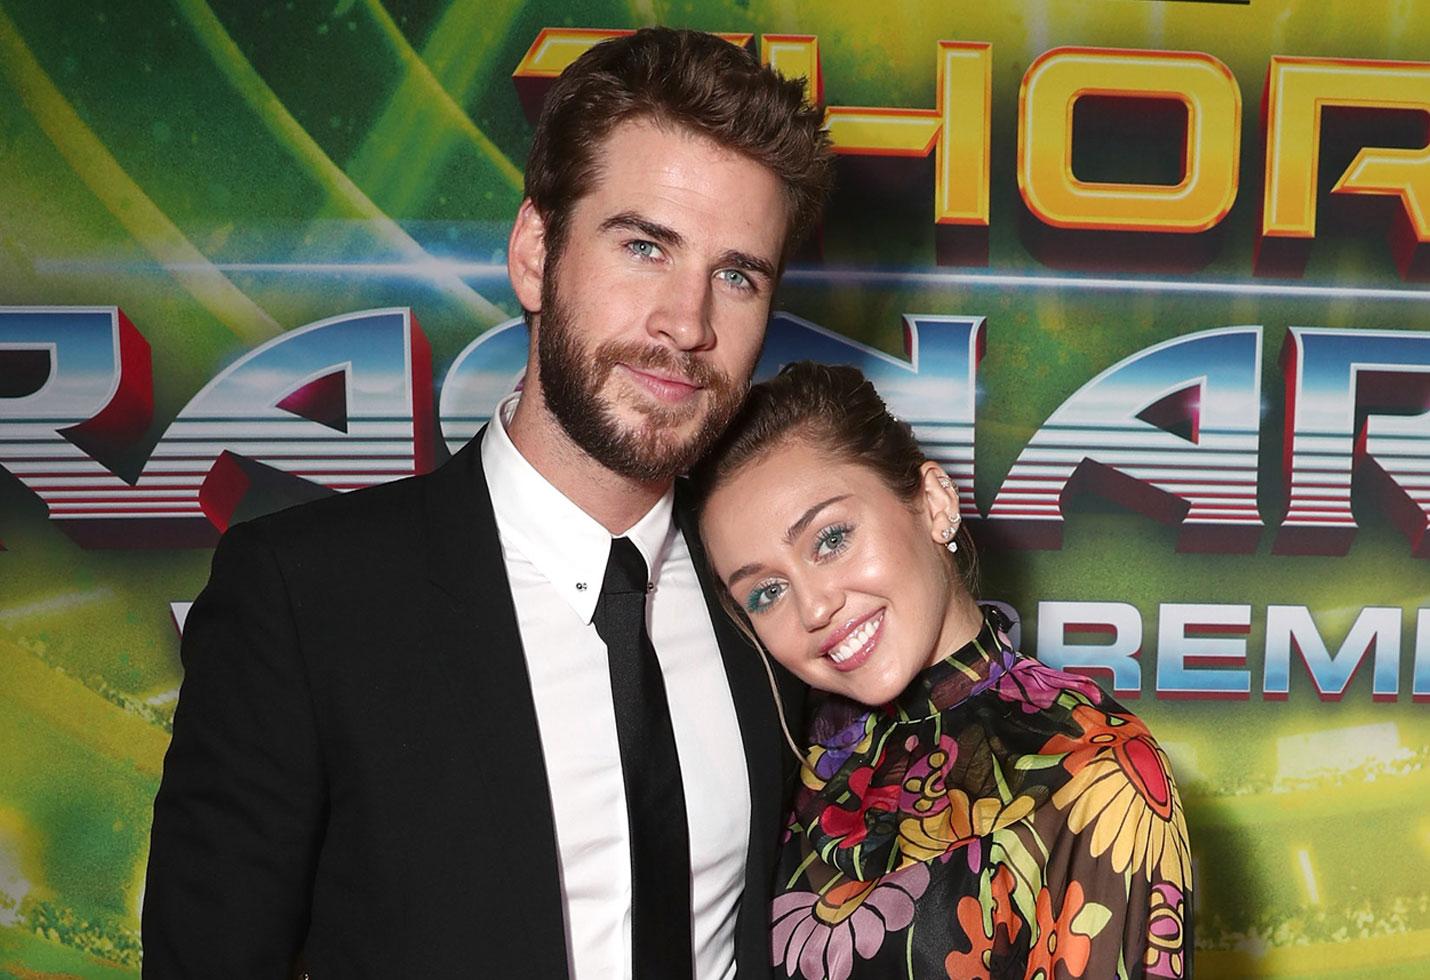 Miley Cyrus Liam Hemsworth Wedding Kids Plans